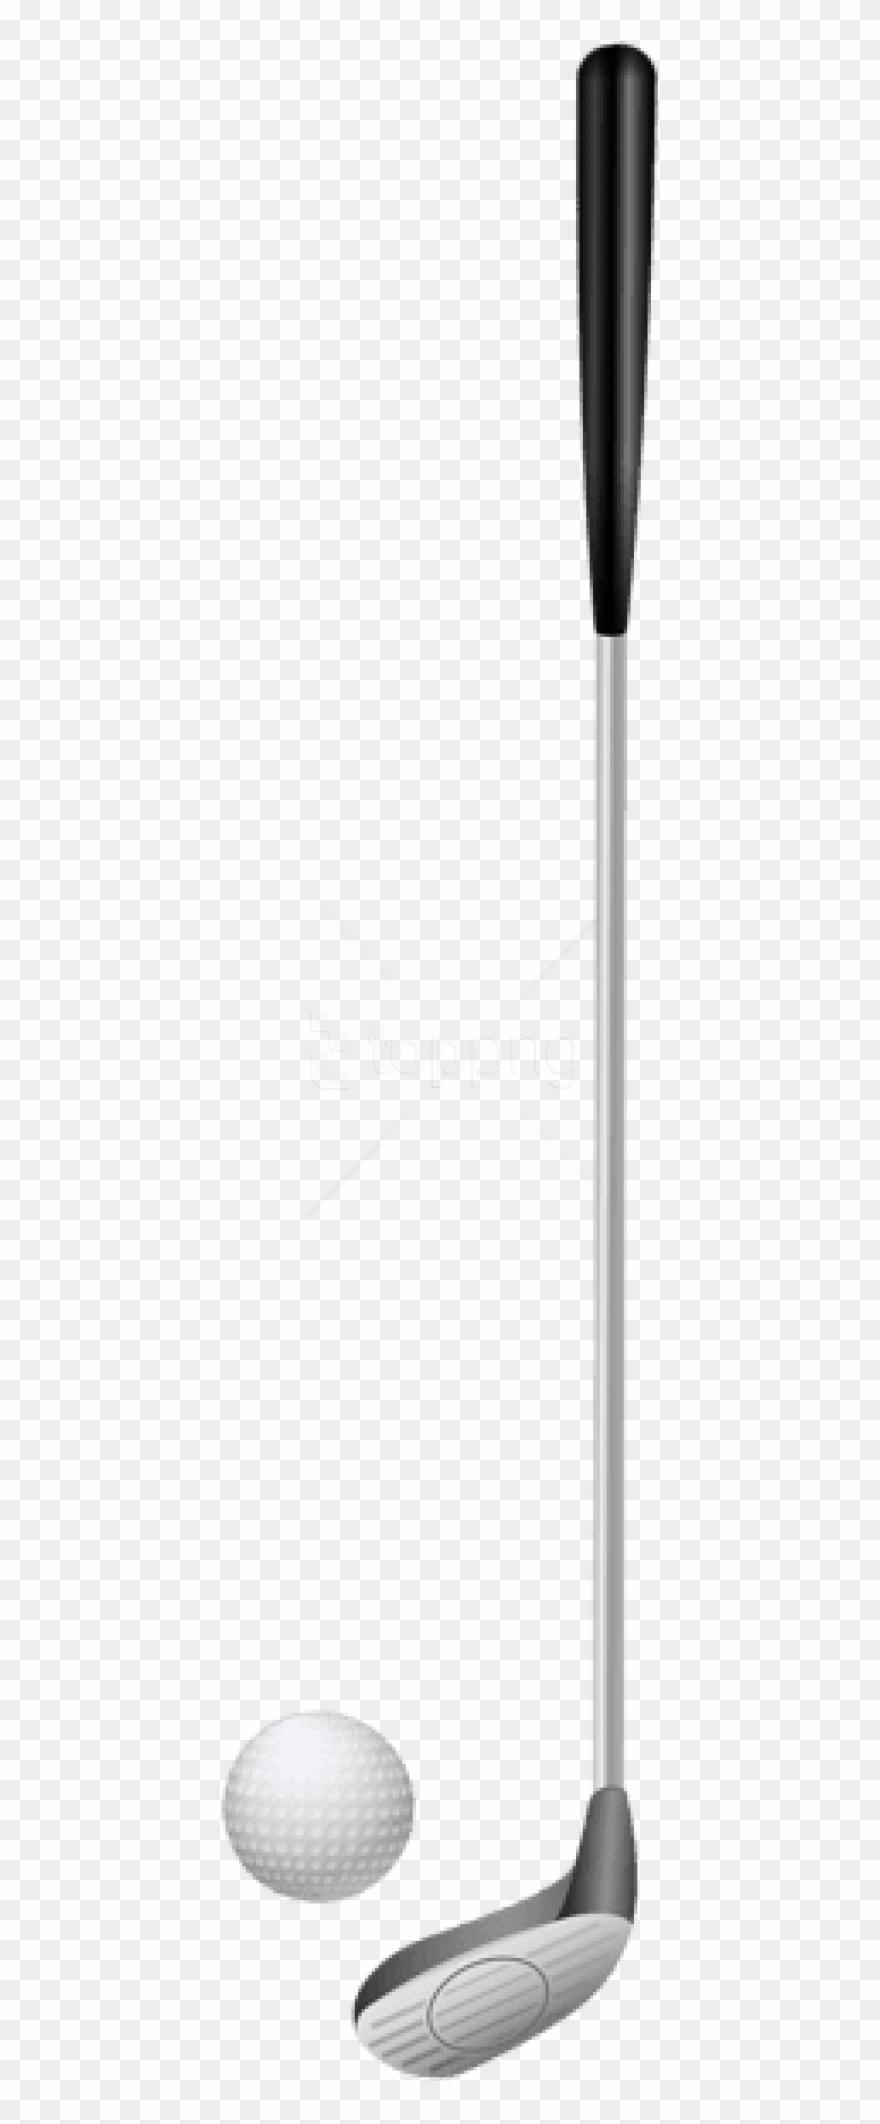 Download Golf Club Stick Png Clipa Art Png Images Background Door Transparent Png 4071977 Pinclipart